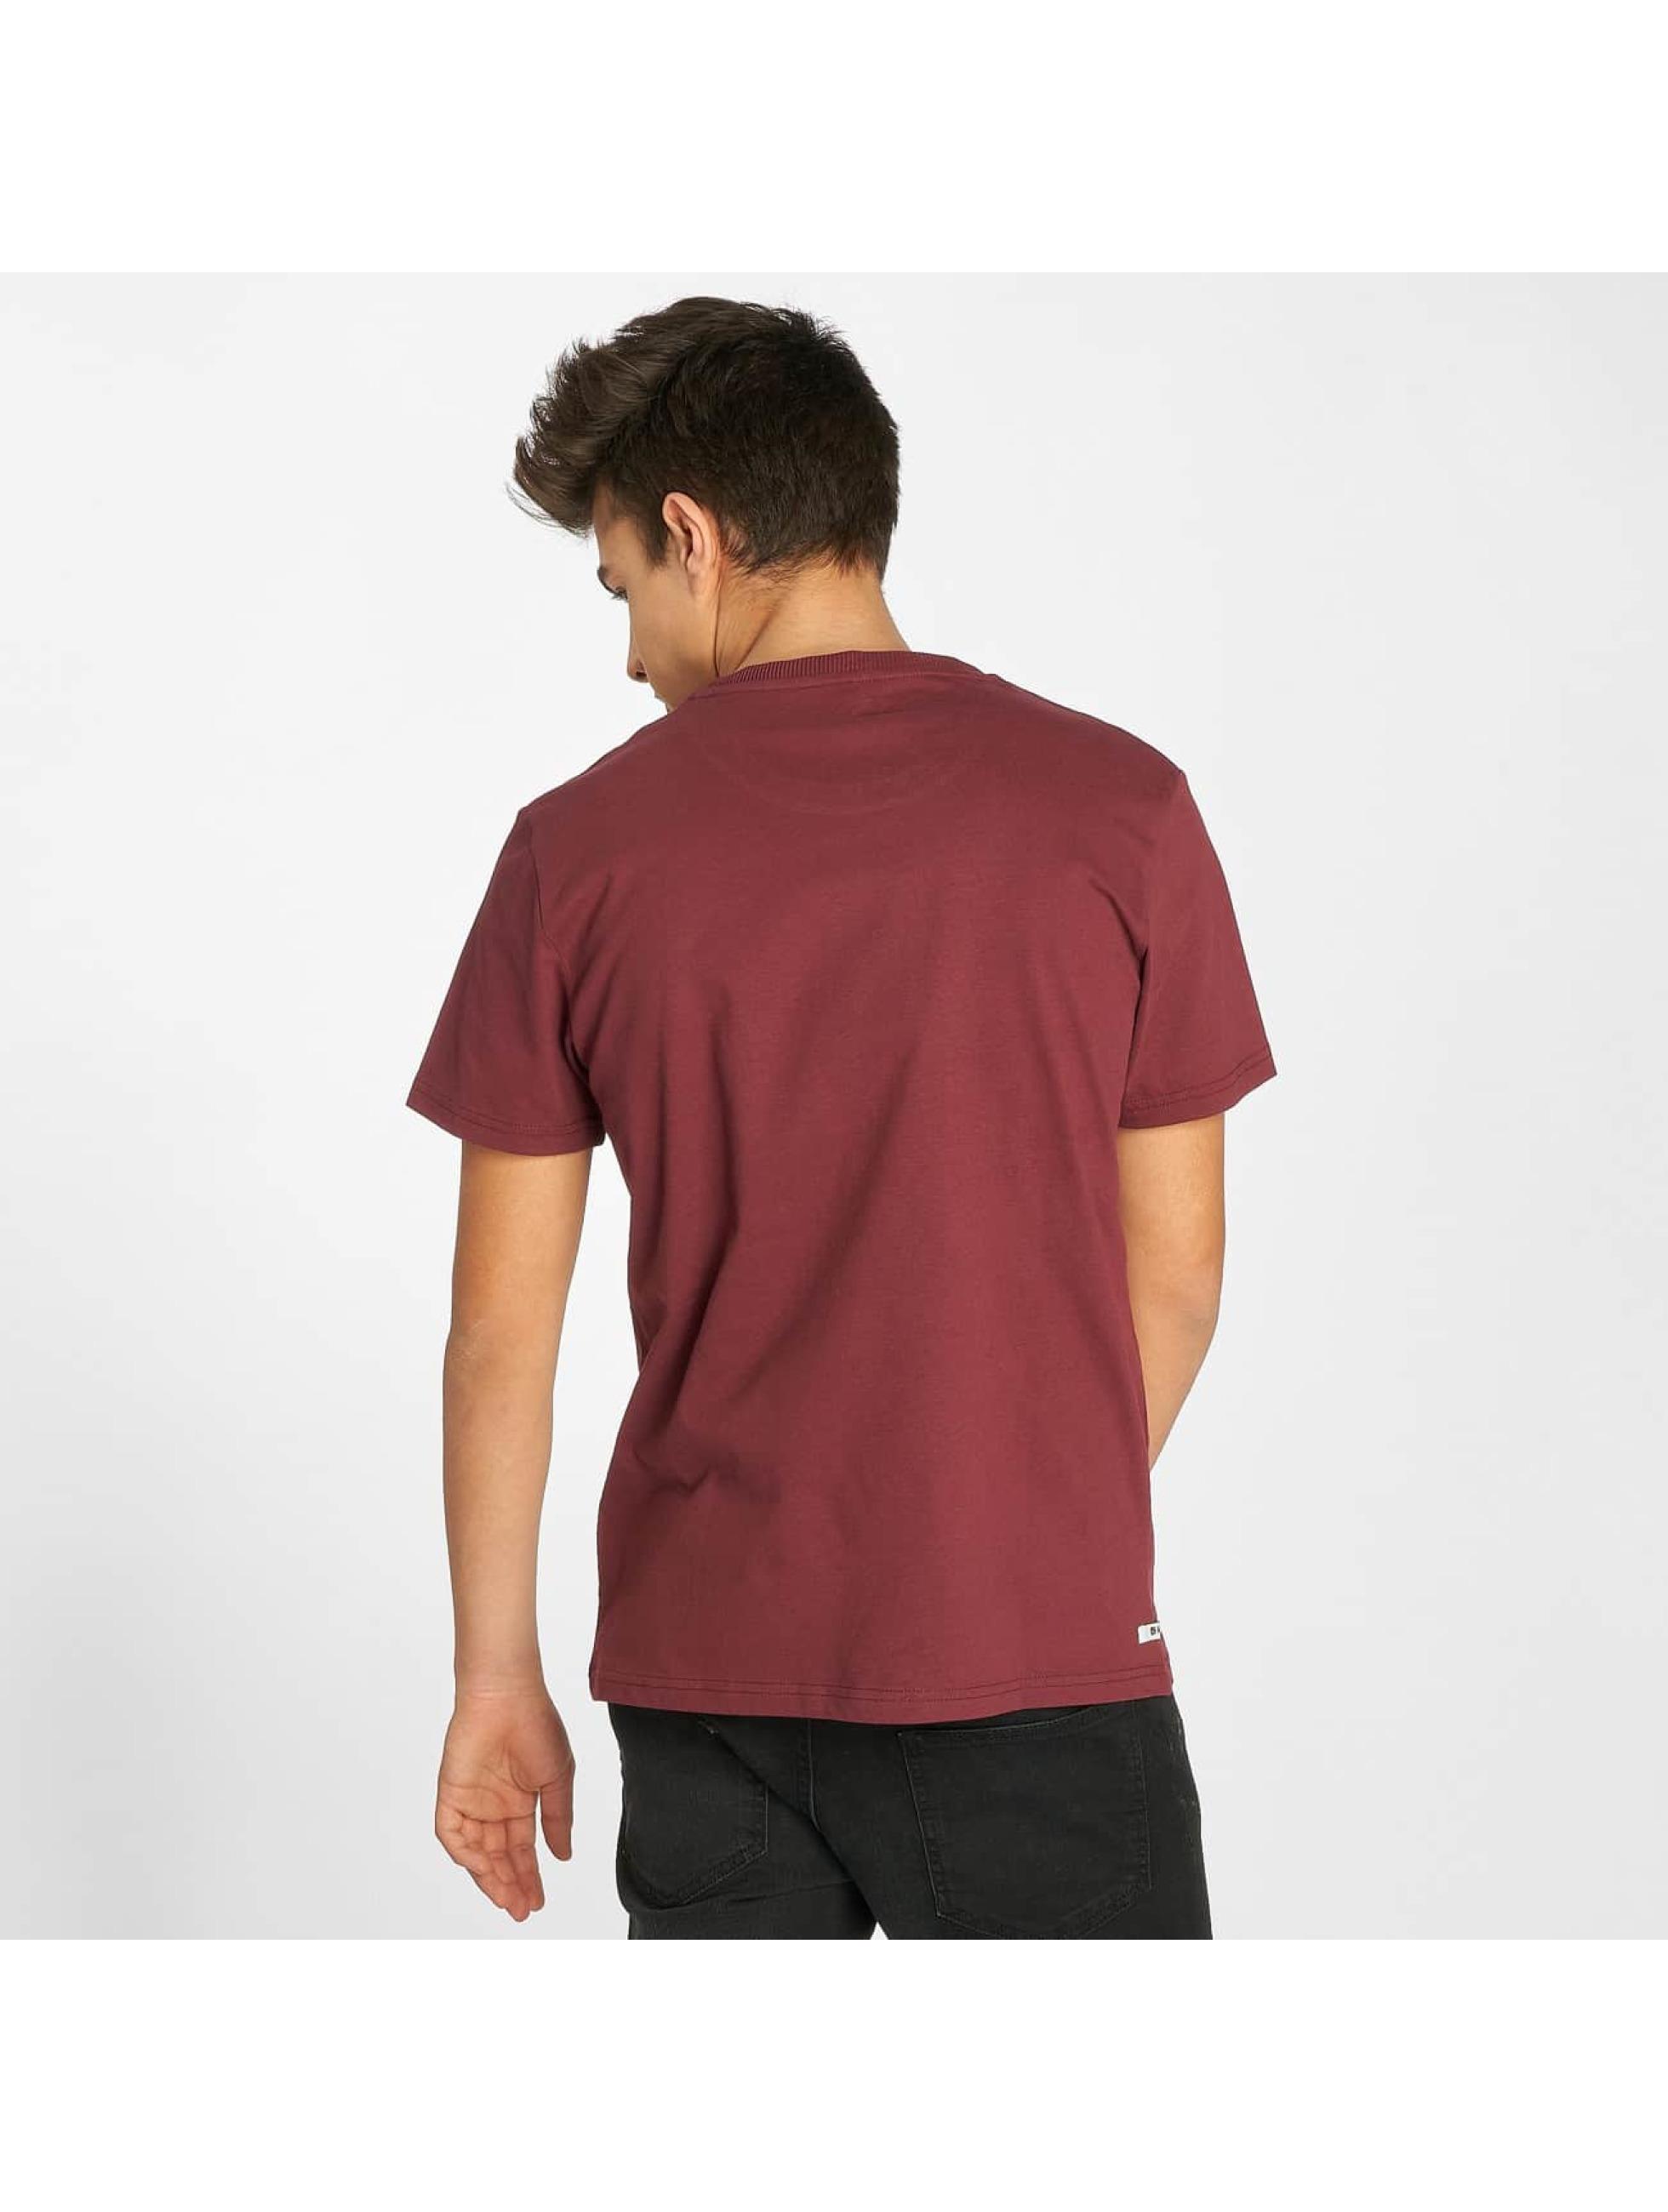 Kulte Camiseta Corpo rojo